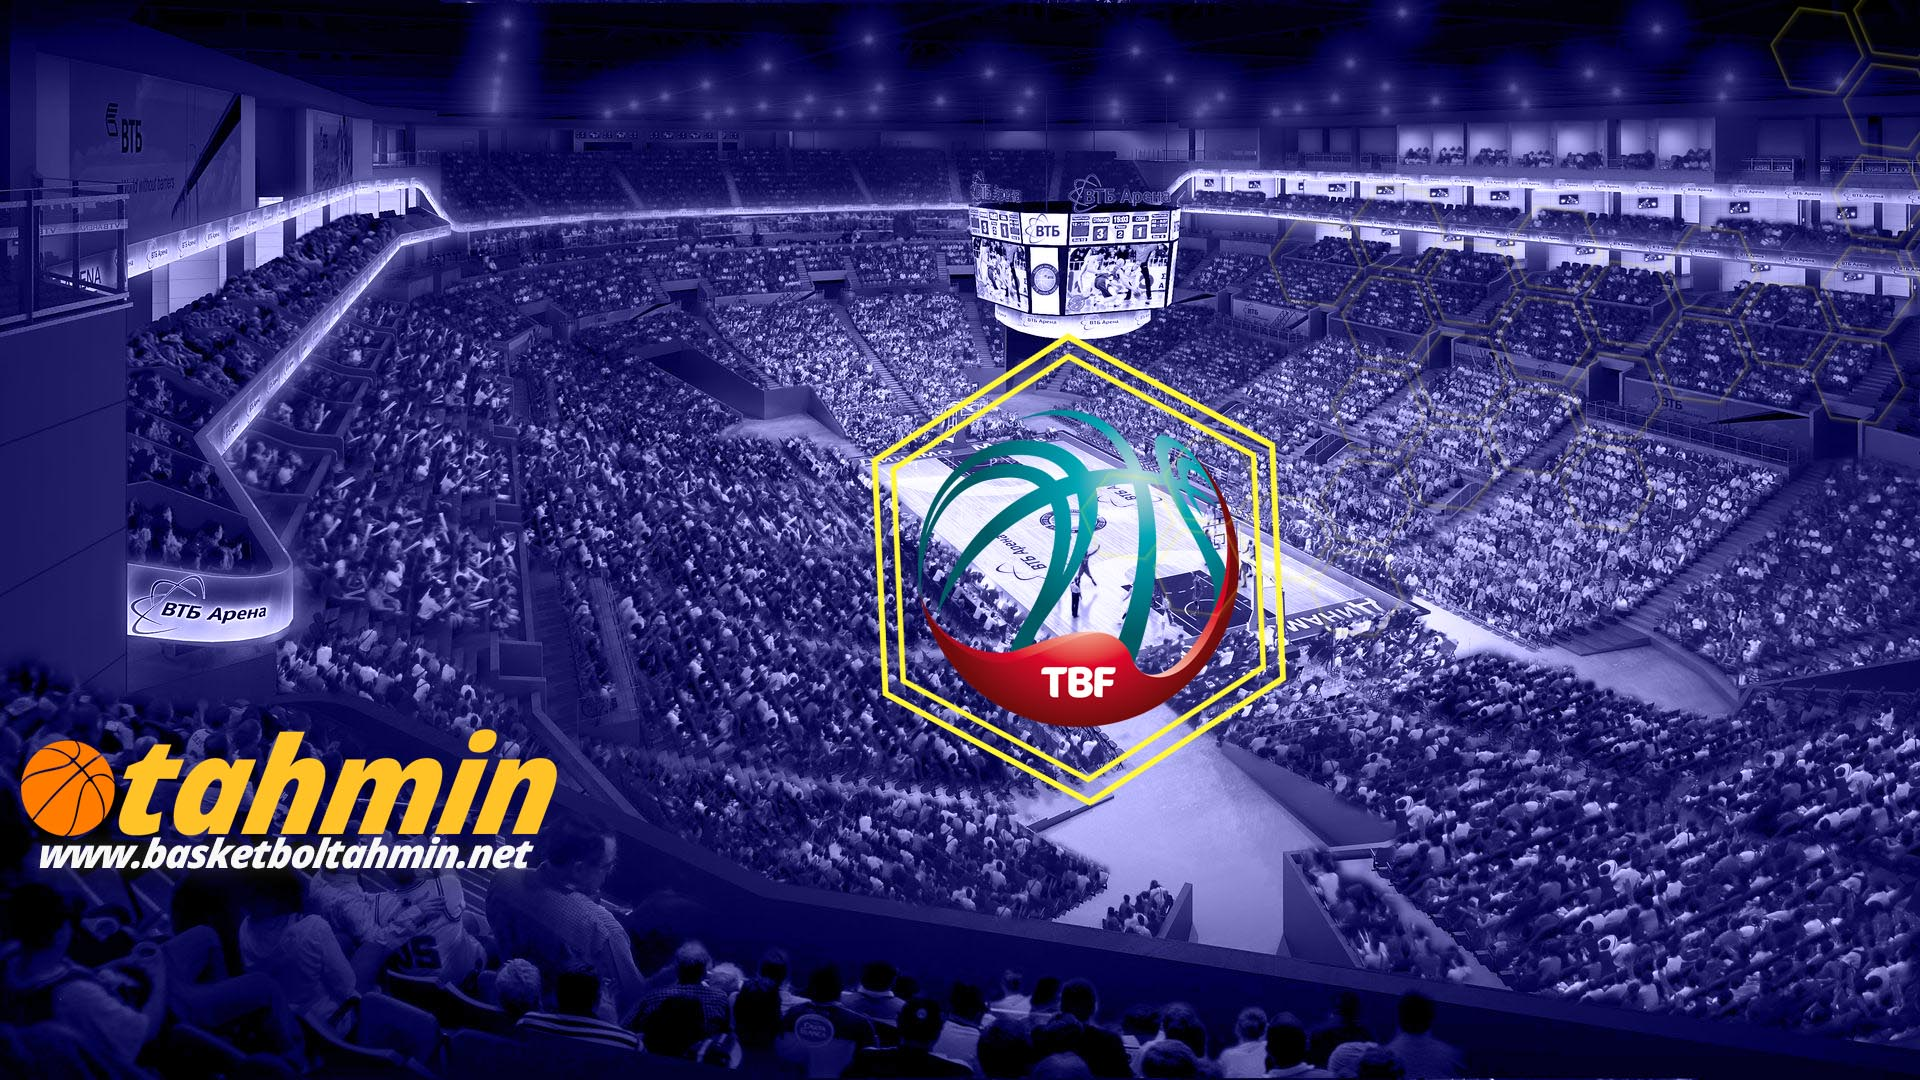 BSL Basketboltahmin.net iddaa tahmin ve anzlizleri